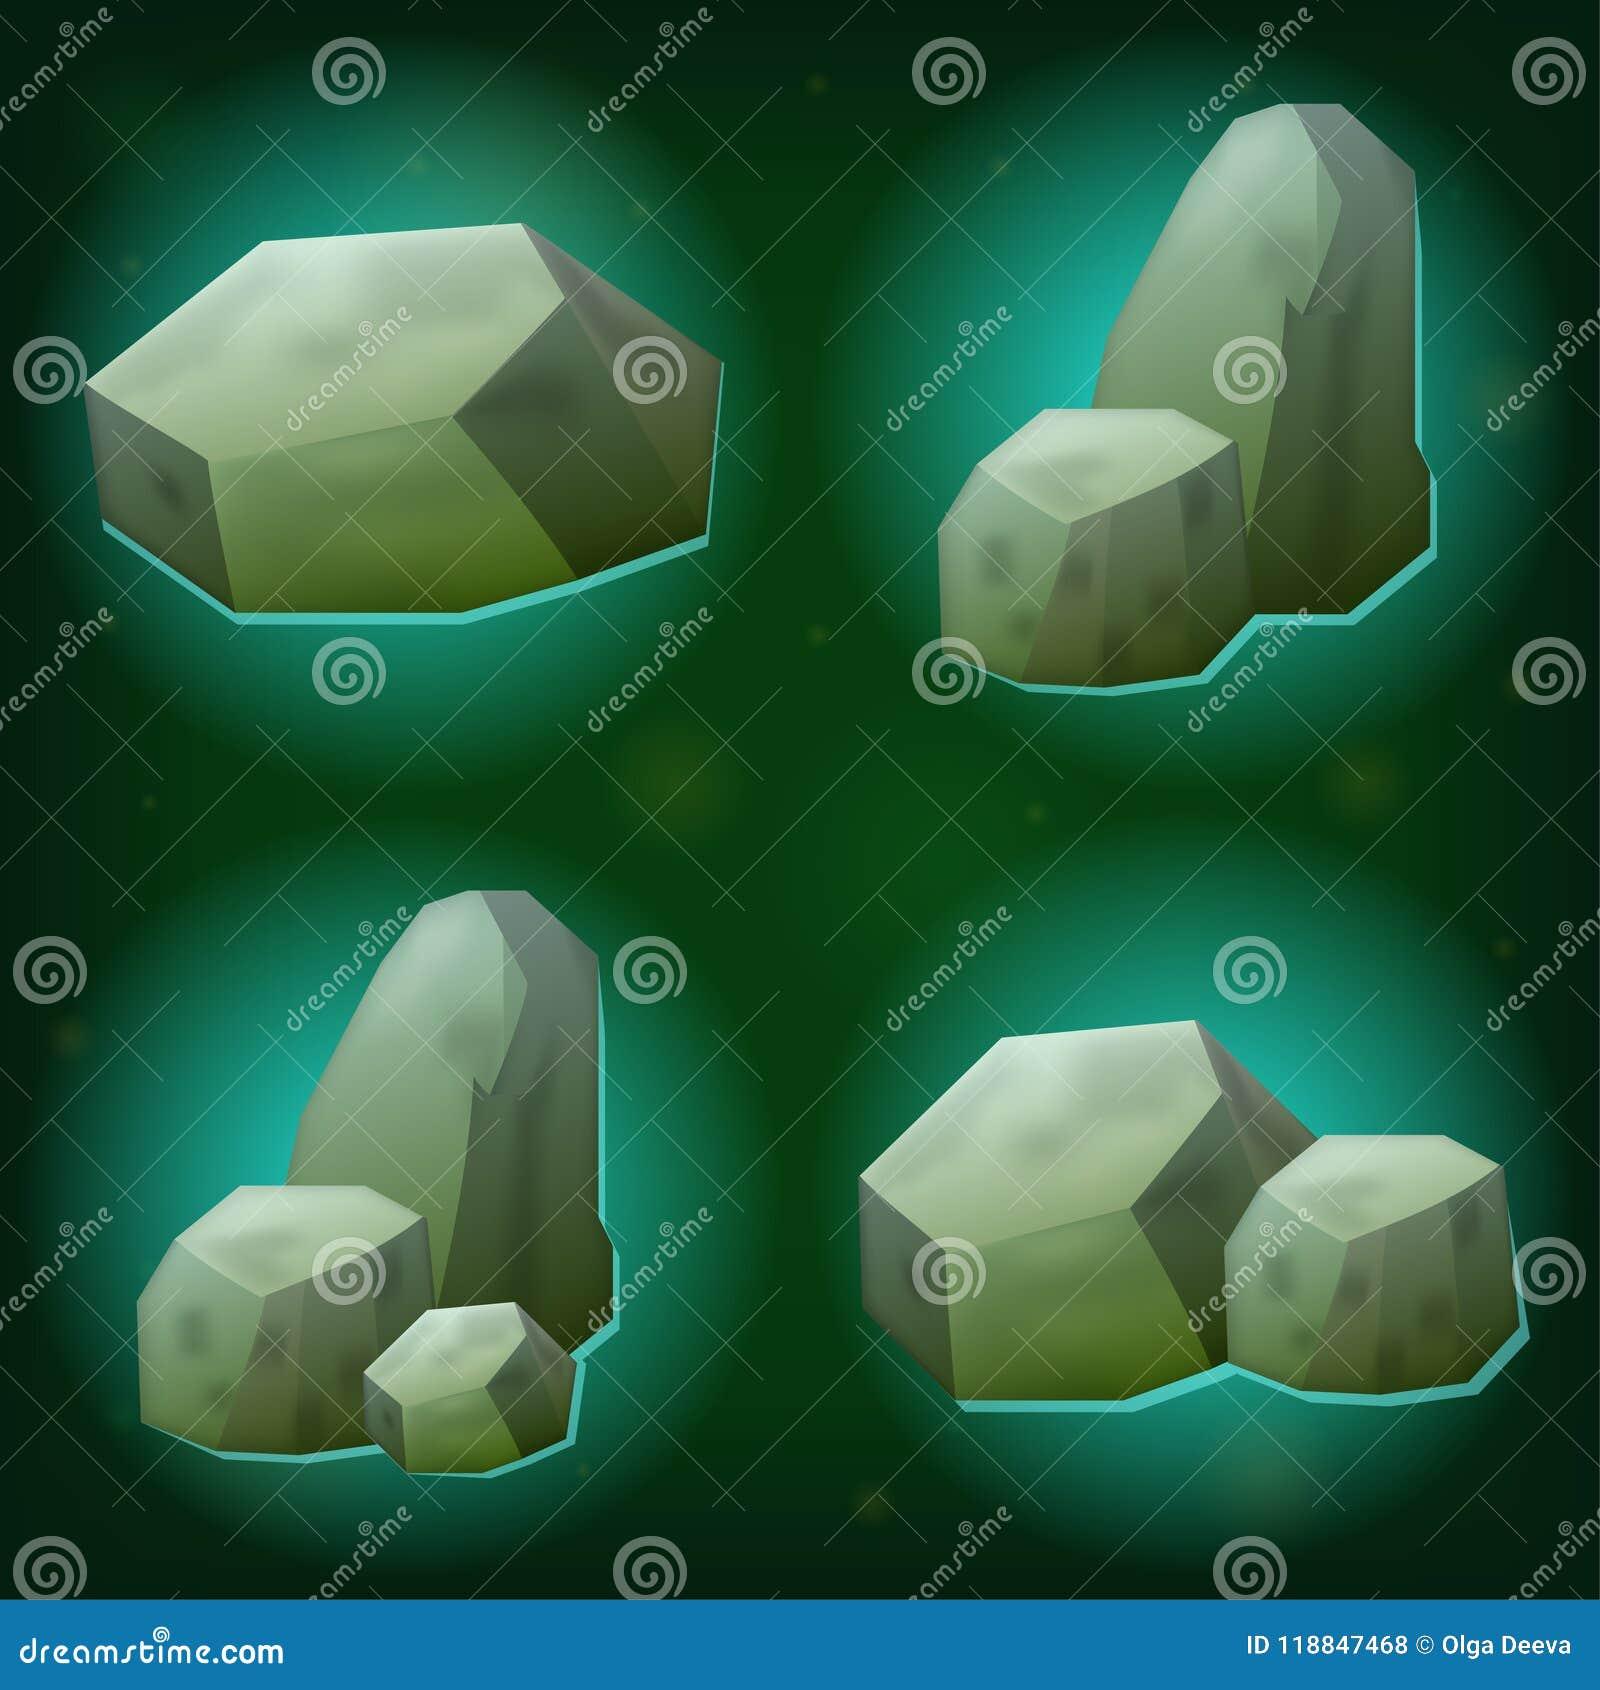 Magic Stone Game